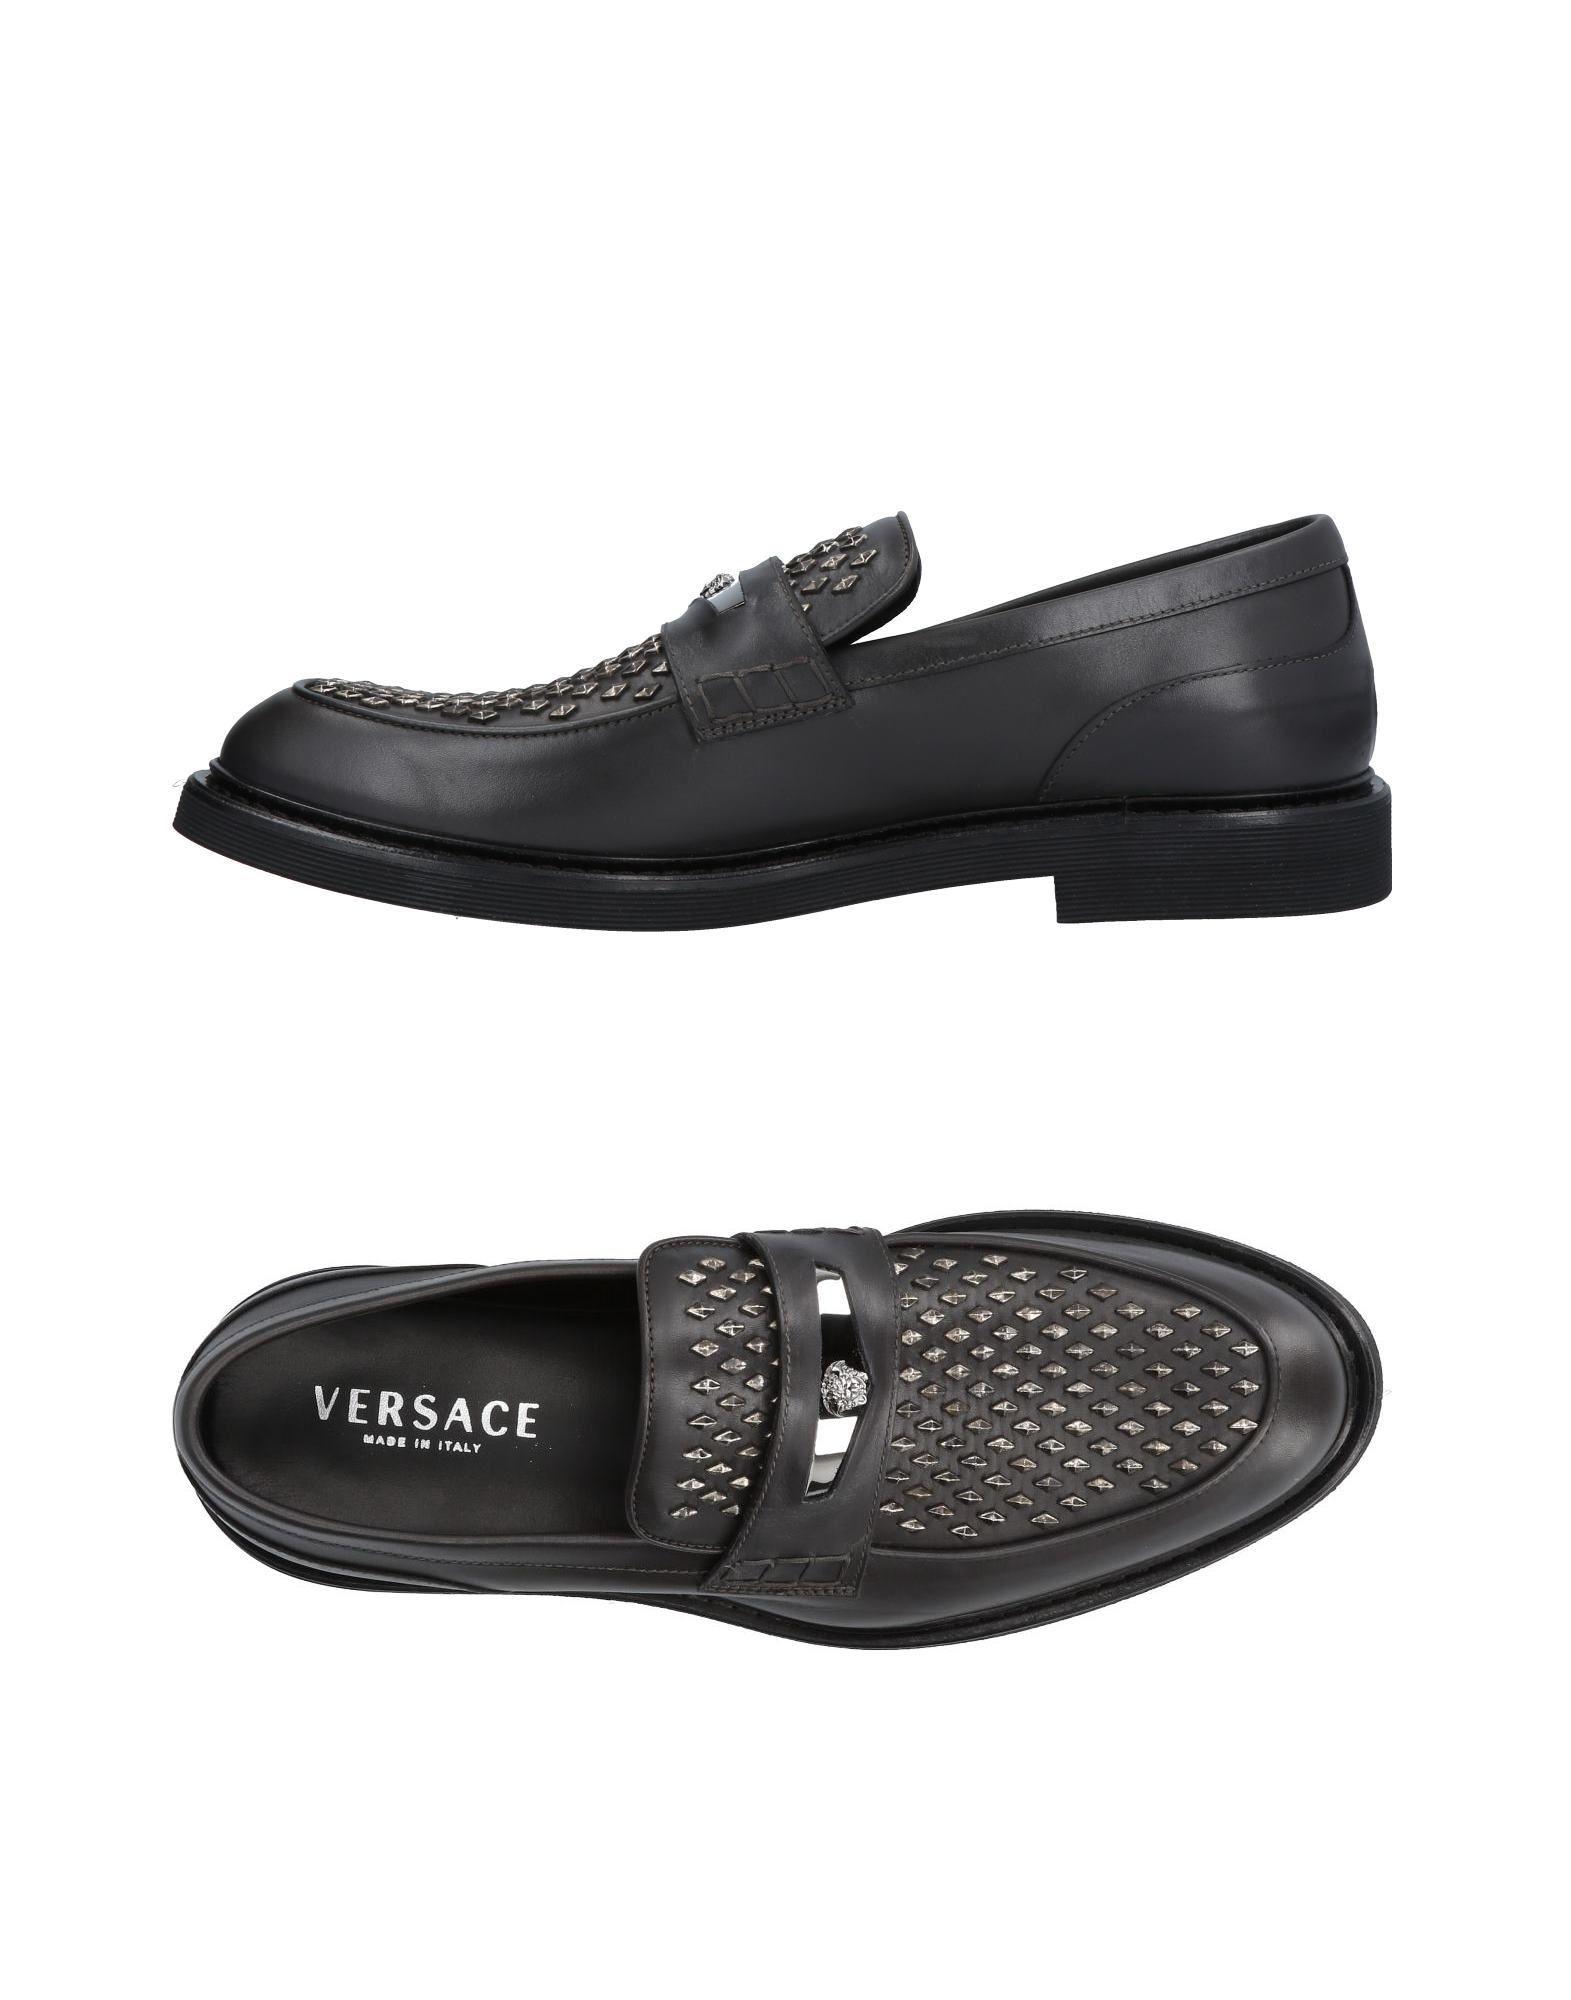 Versace Mokassins Herren  11421129HG Gute Qualität beliebte Schuhe